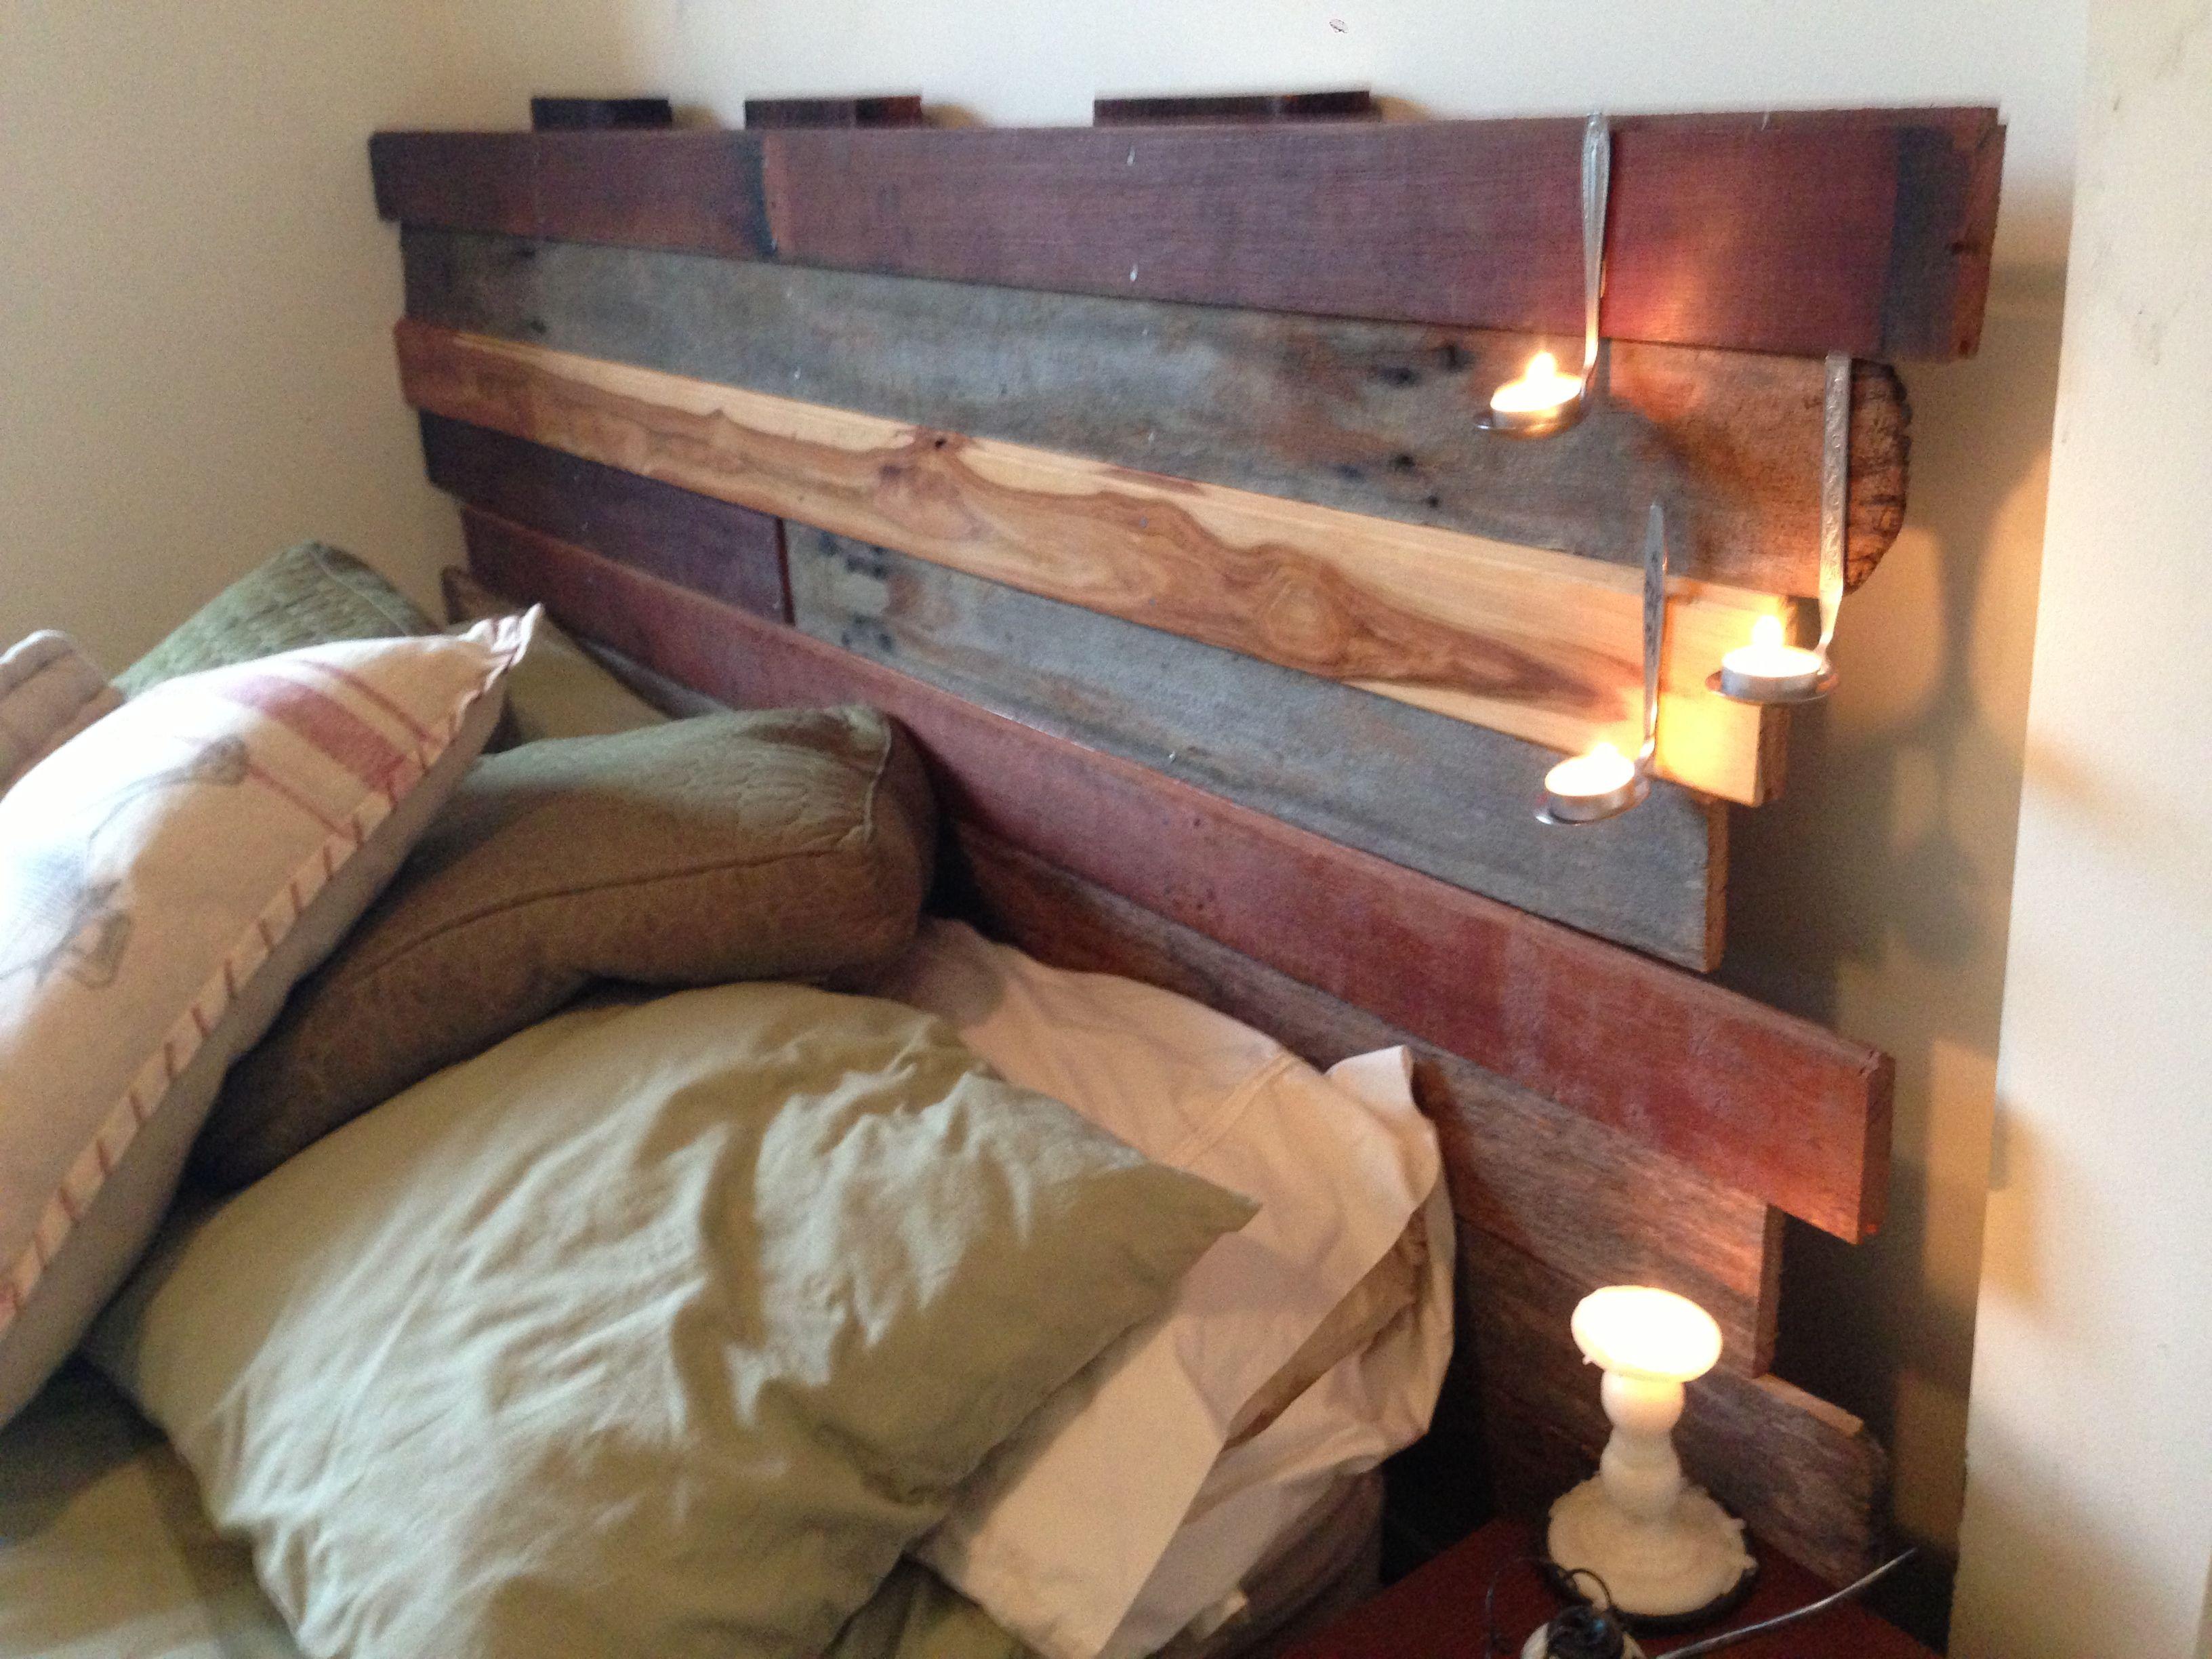 diy reclaimed timber bedhead - Diy Kingsizekopfteil Plne